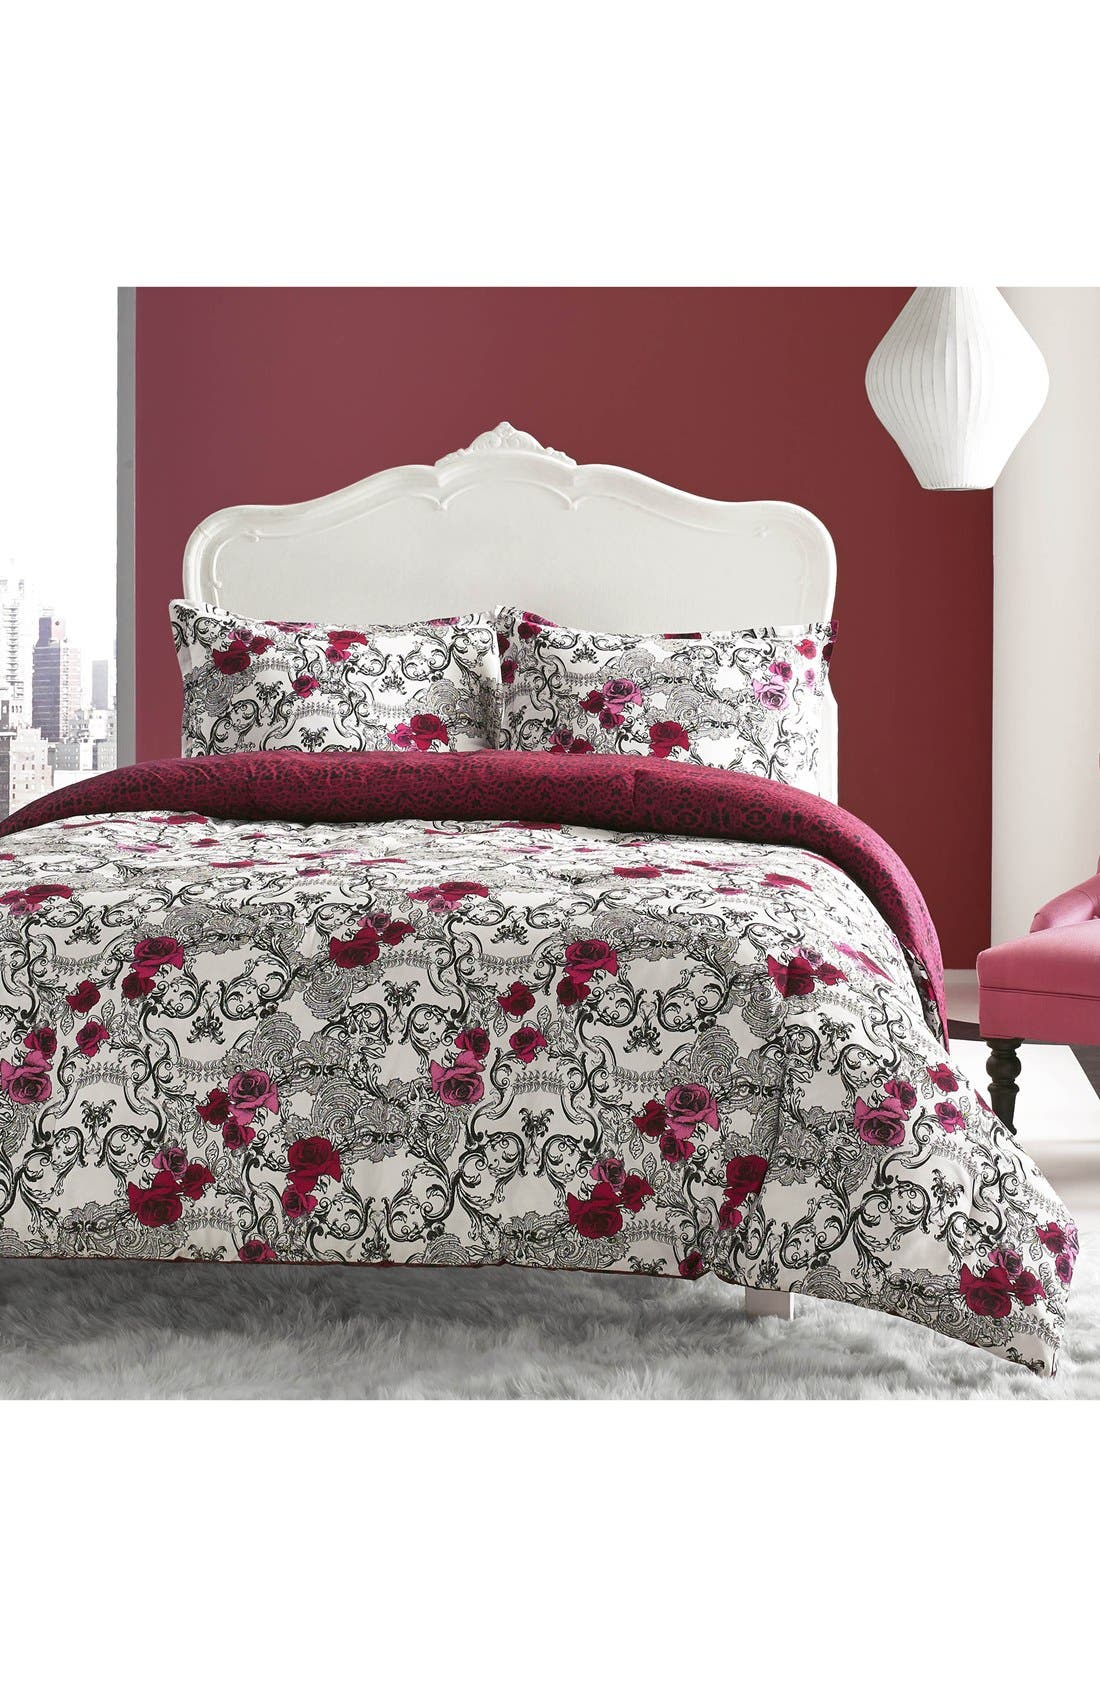 Main Image - Betsey Johnson Bedding Rock Out Reversible Comforter & Sham Set